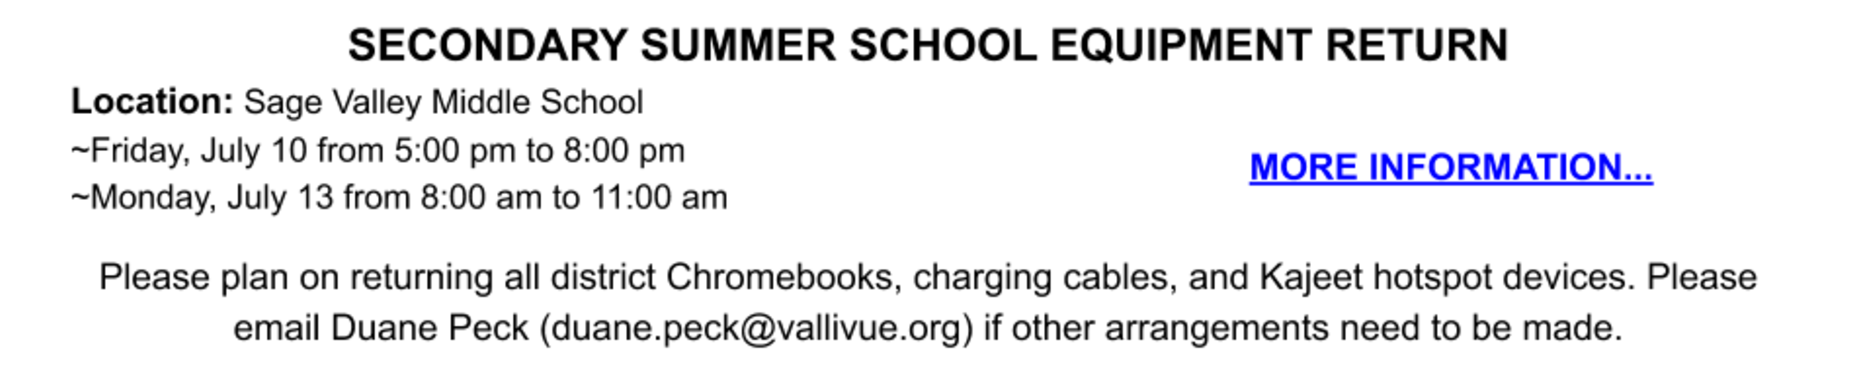 Summer School Equipment Return